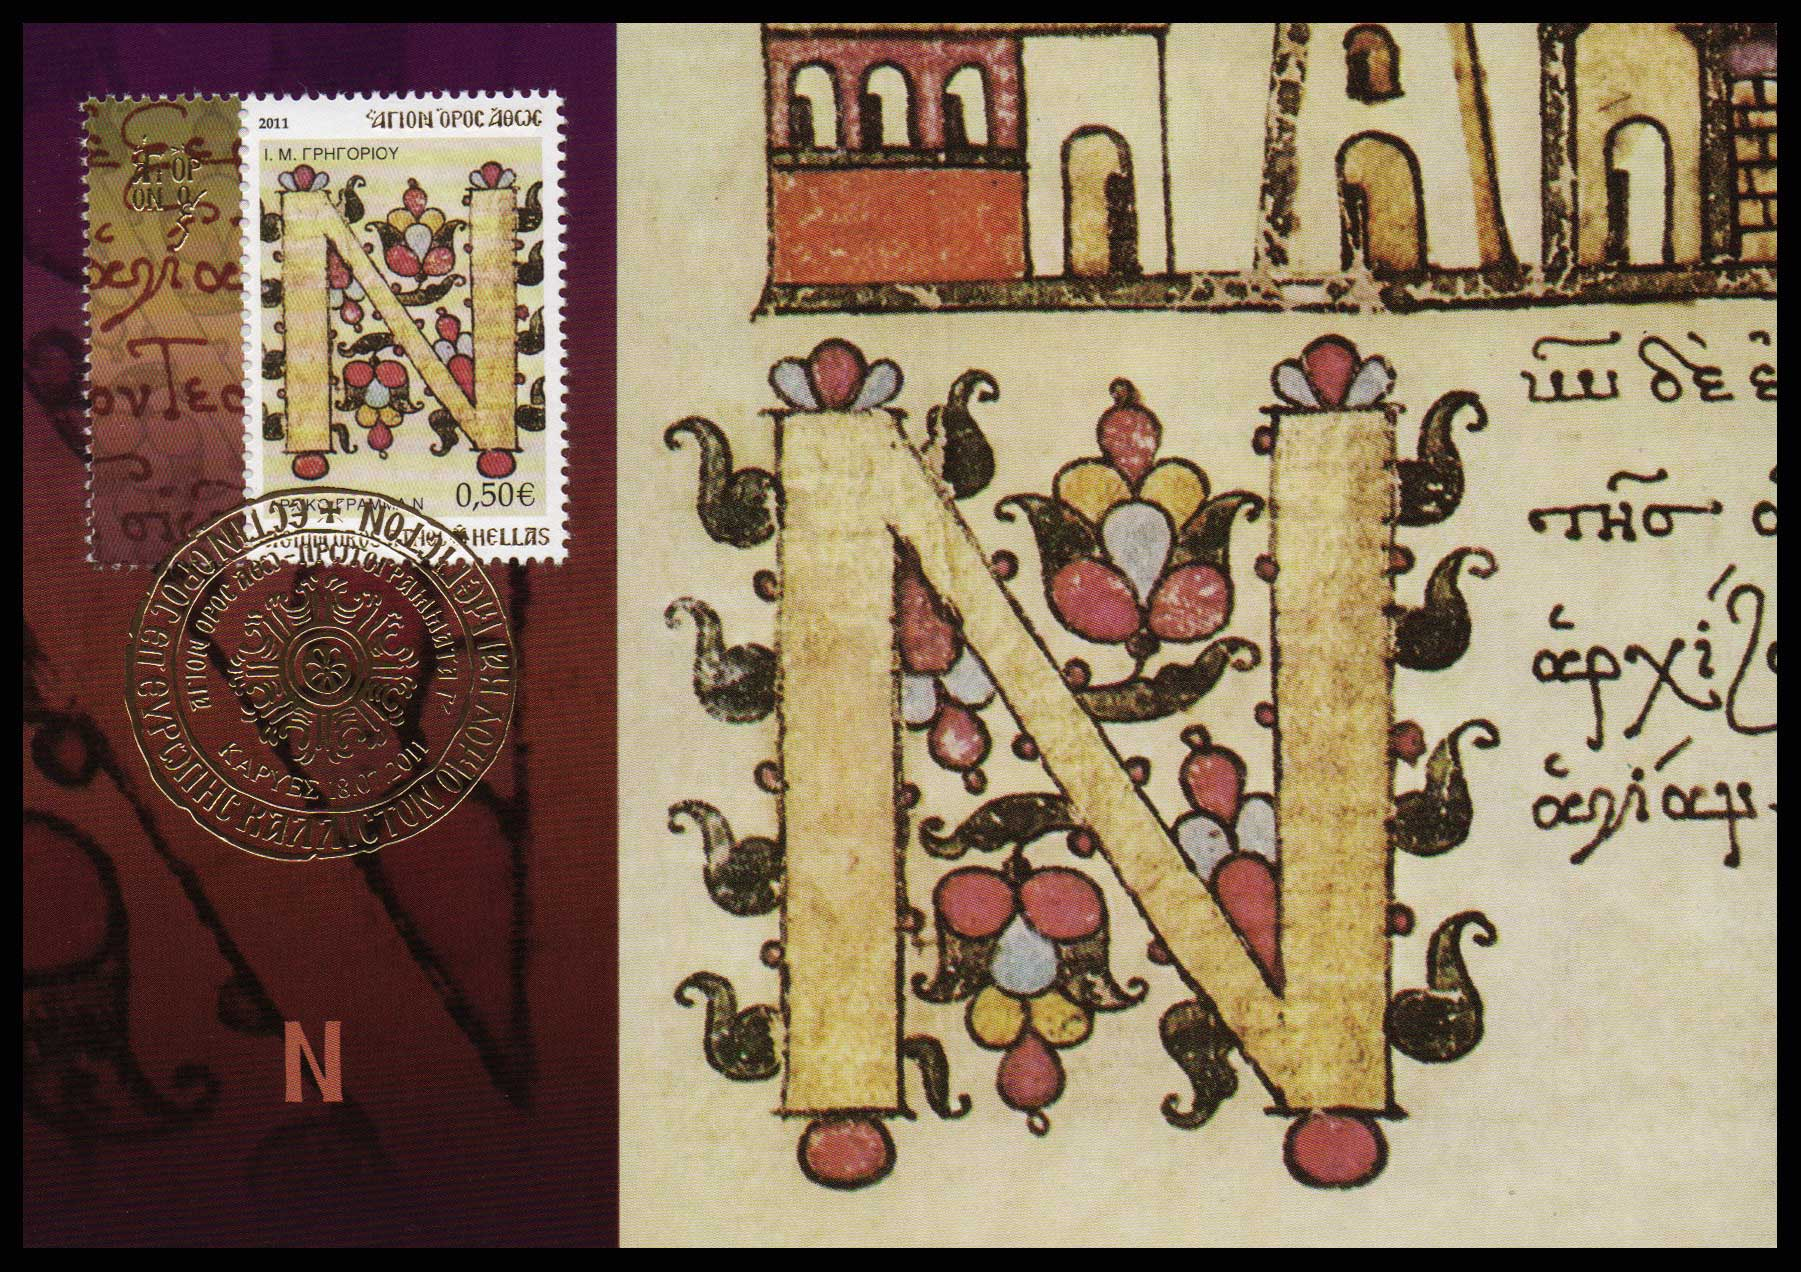 Lot 811 - - 1945-2013 agion oros philatelic collection -  Athens Auctions Public Auction 74 General Stamp Sale